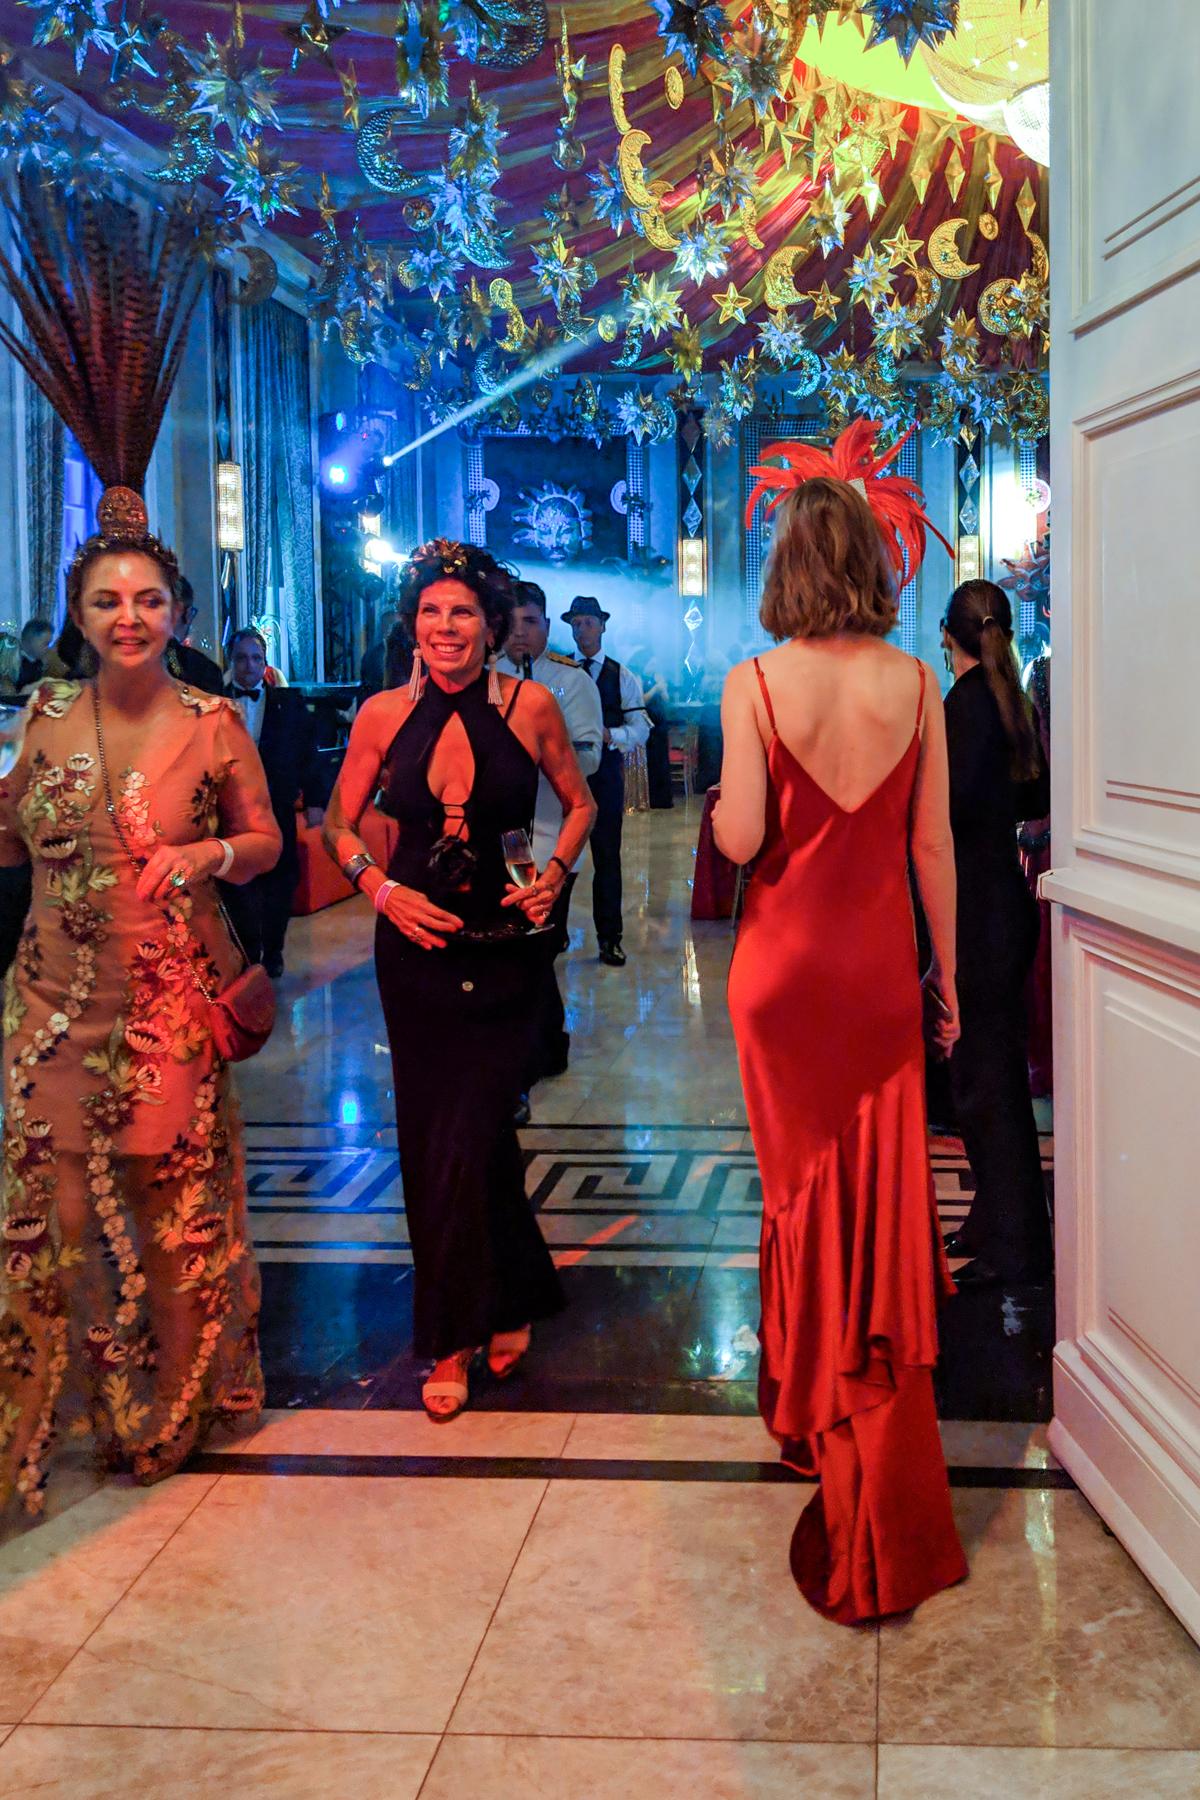 Stacie Flinner x Belmond Copacabana Carnival Ball-19.jpg